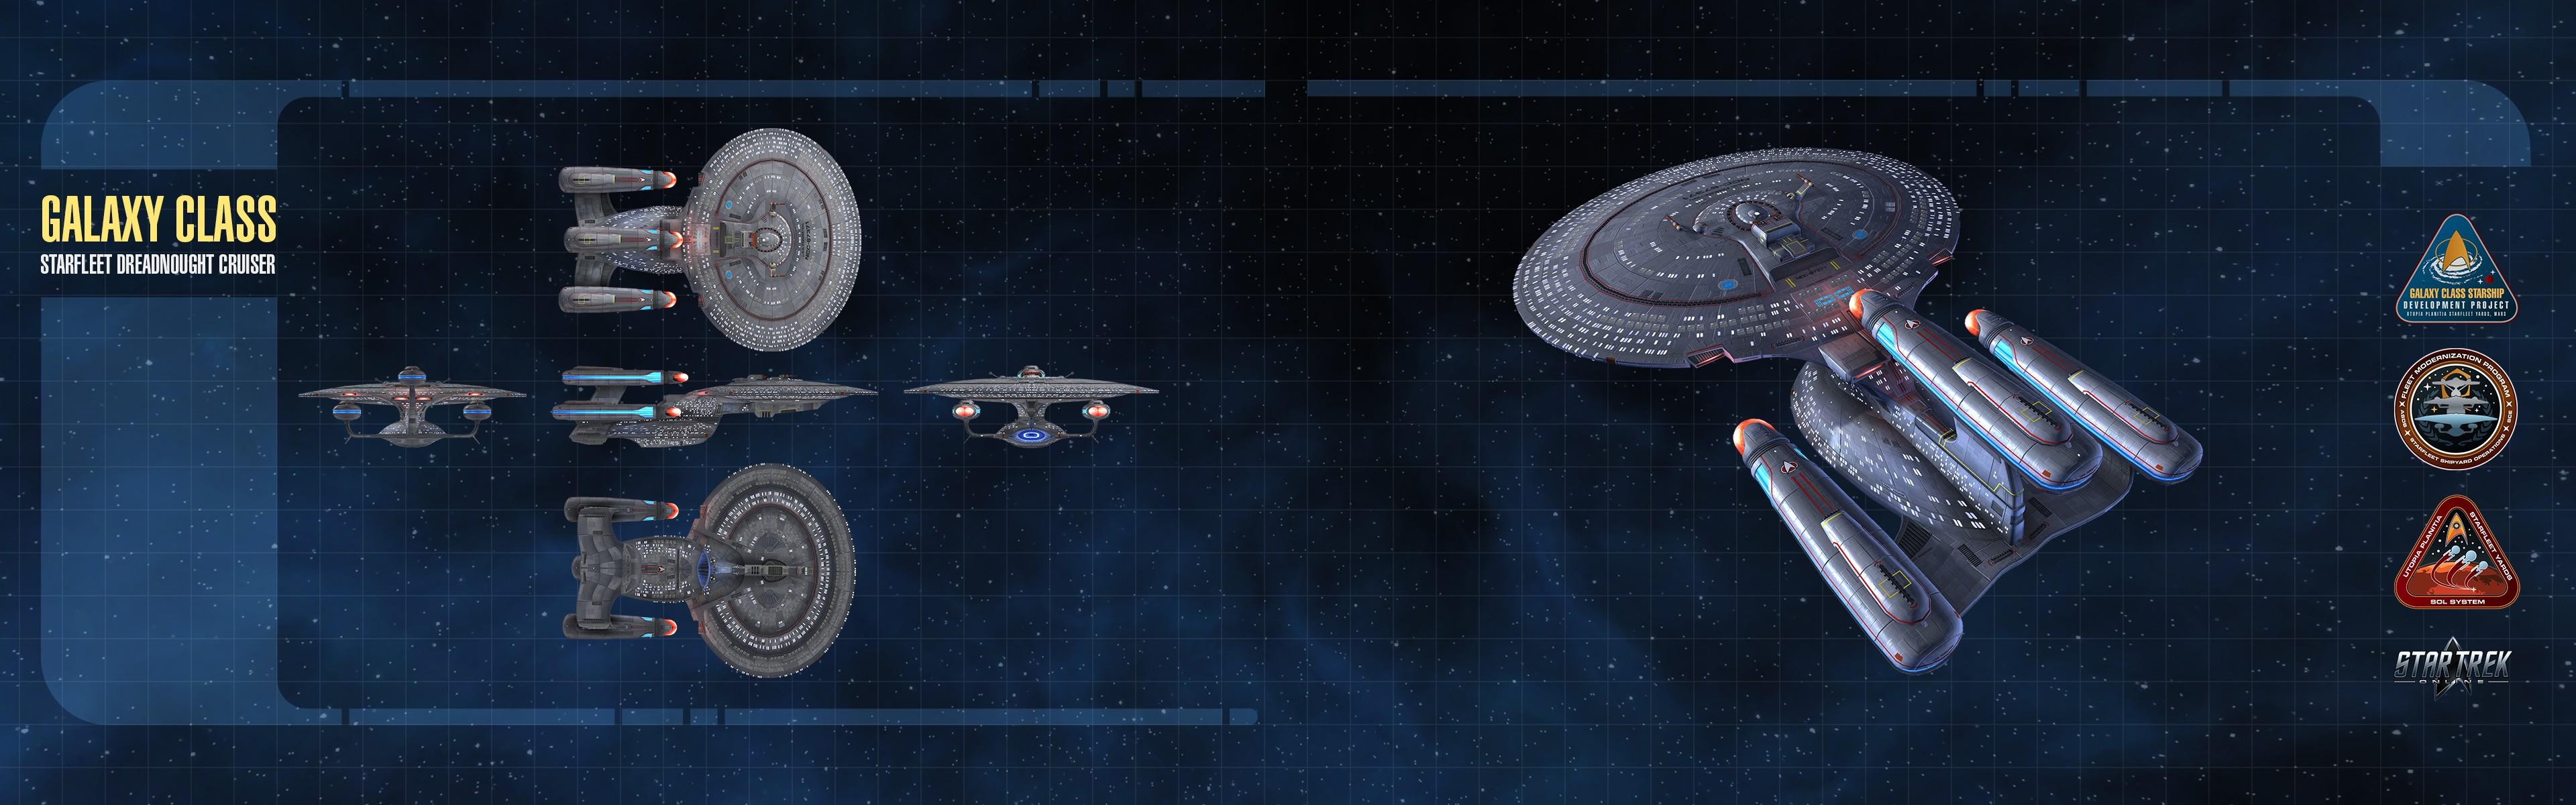 Wallpaper Space Vehicle Spaceship Dual Monitors Multiple Display Star Trek Screenshot 3840x1200 Izmirli 100573 Hd Wallpapers Wallhere